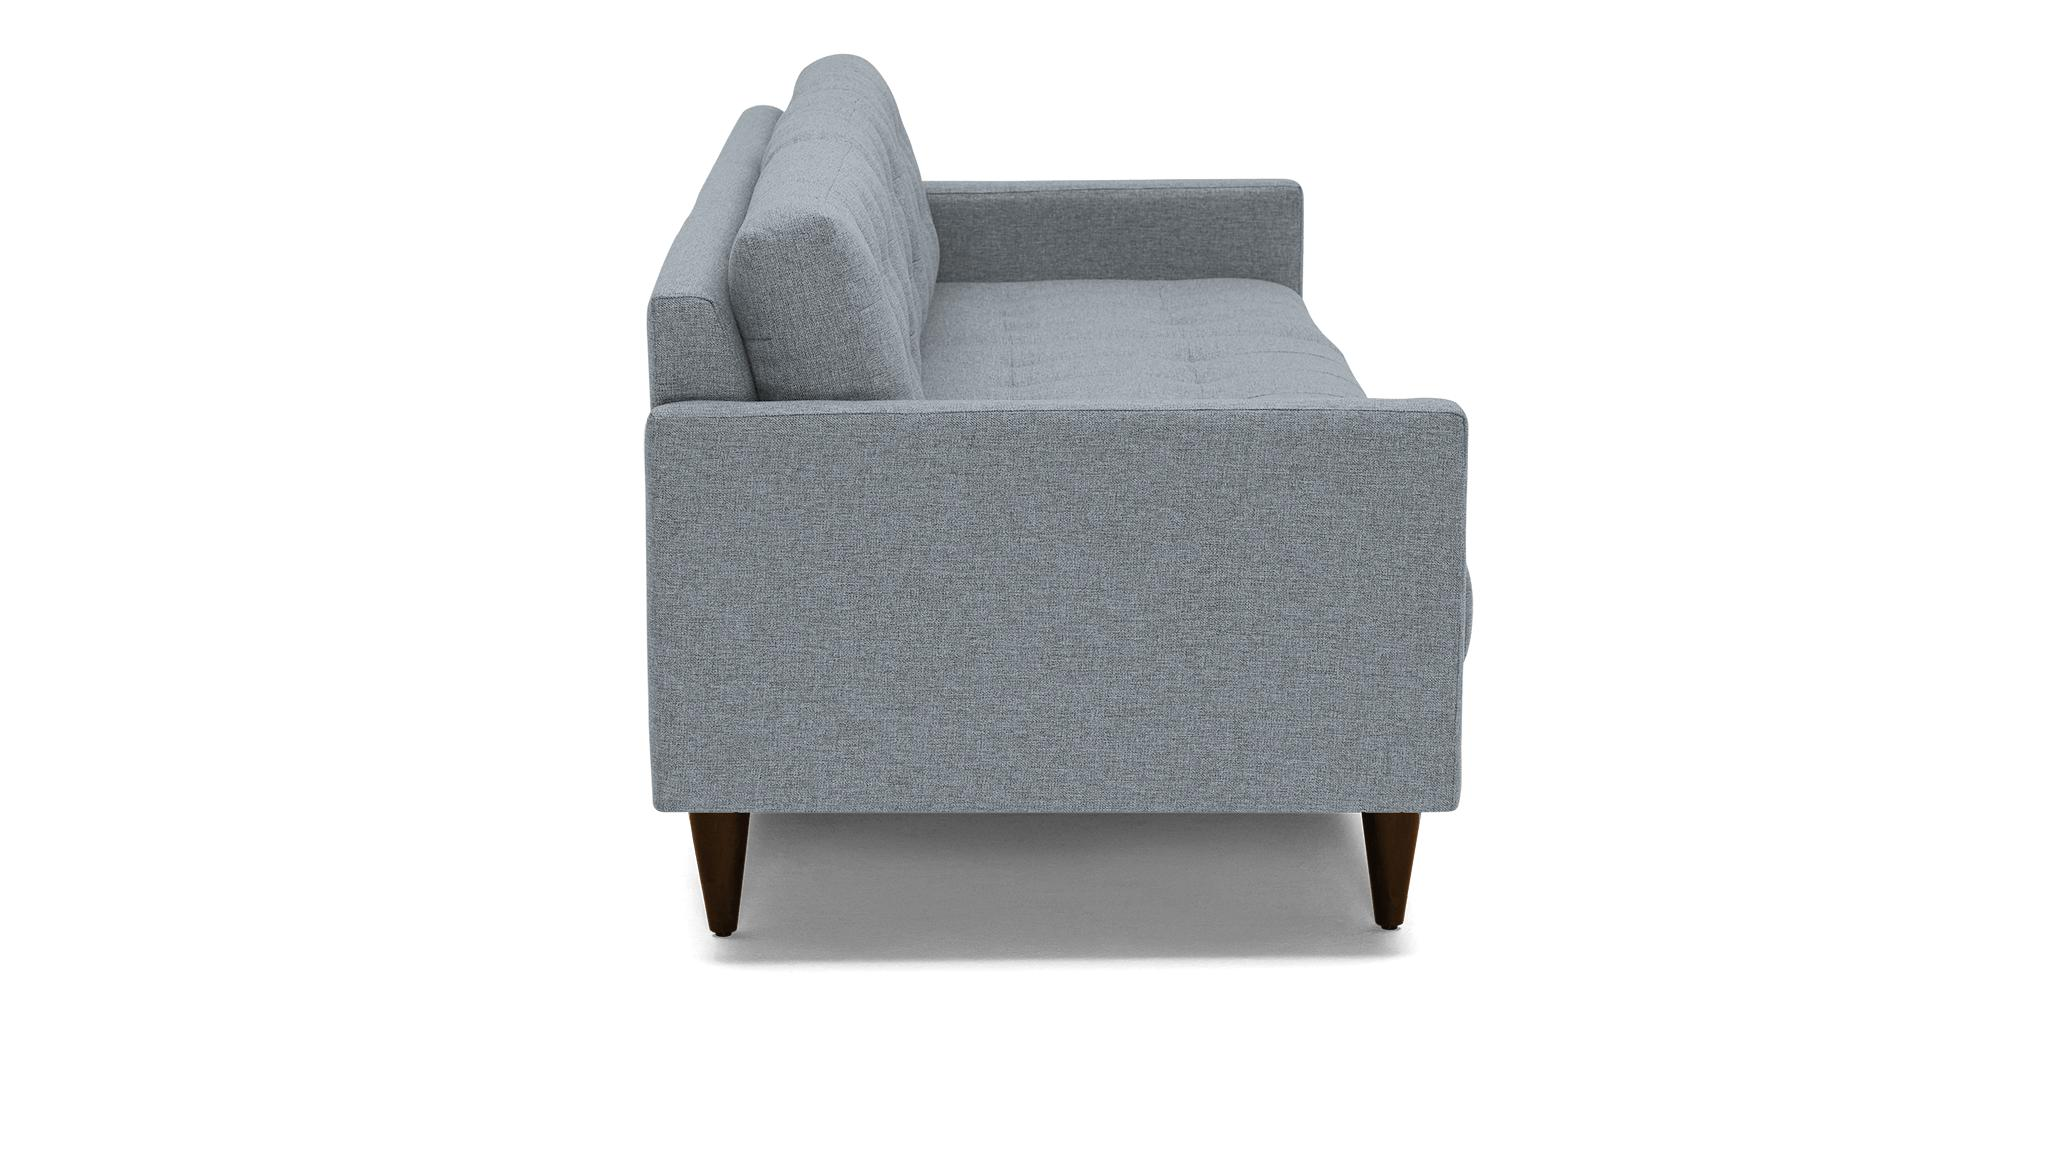 Gray Eliot Mid Century Modern Grand Sofa - Synergy Pewter - Mocha